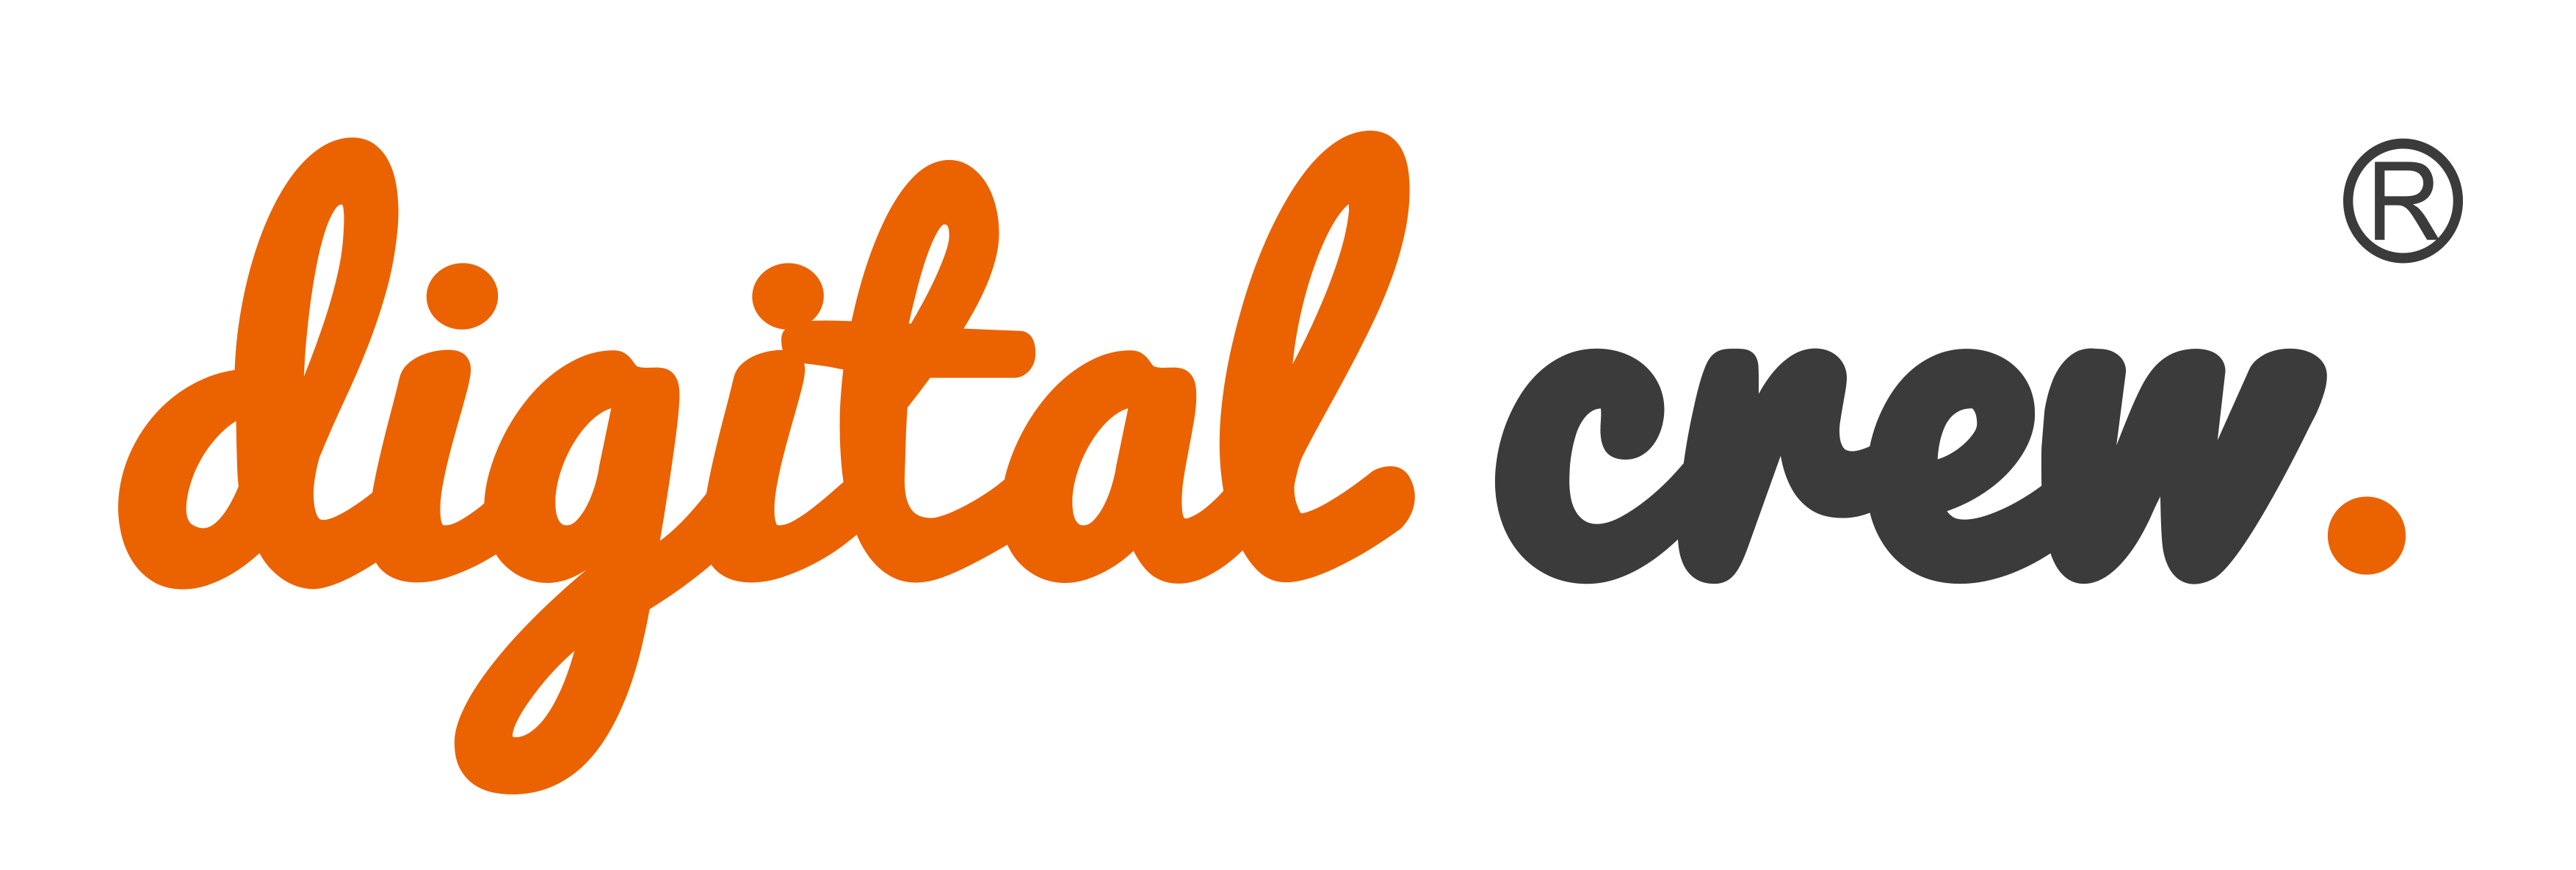 Digital Crew Logo